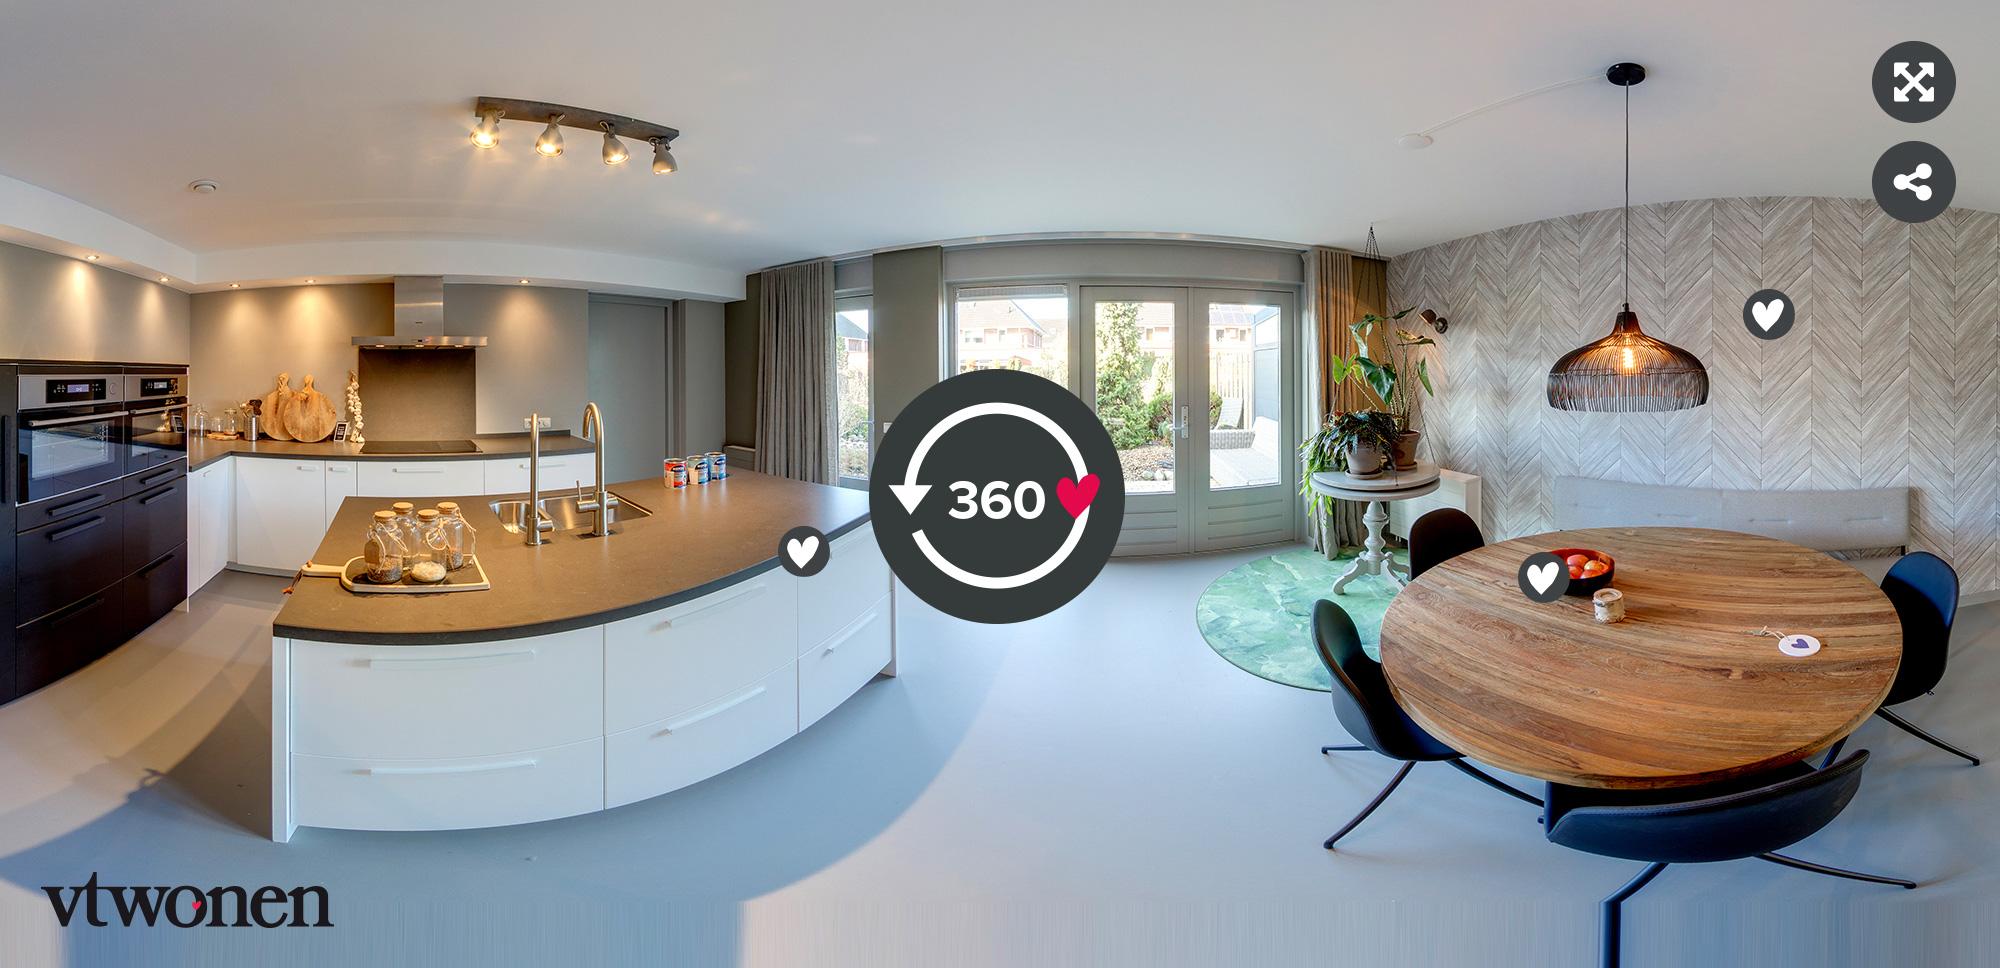 vtwonen verhuist - aflevering 1 seizoen 1 - Frans Uyterlinde - 360 tour